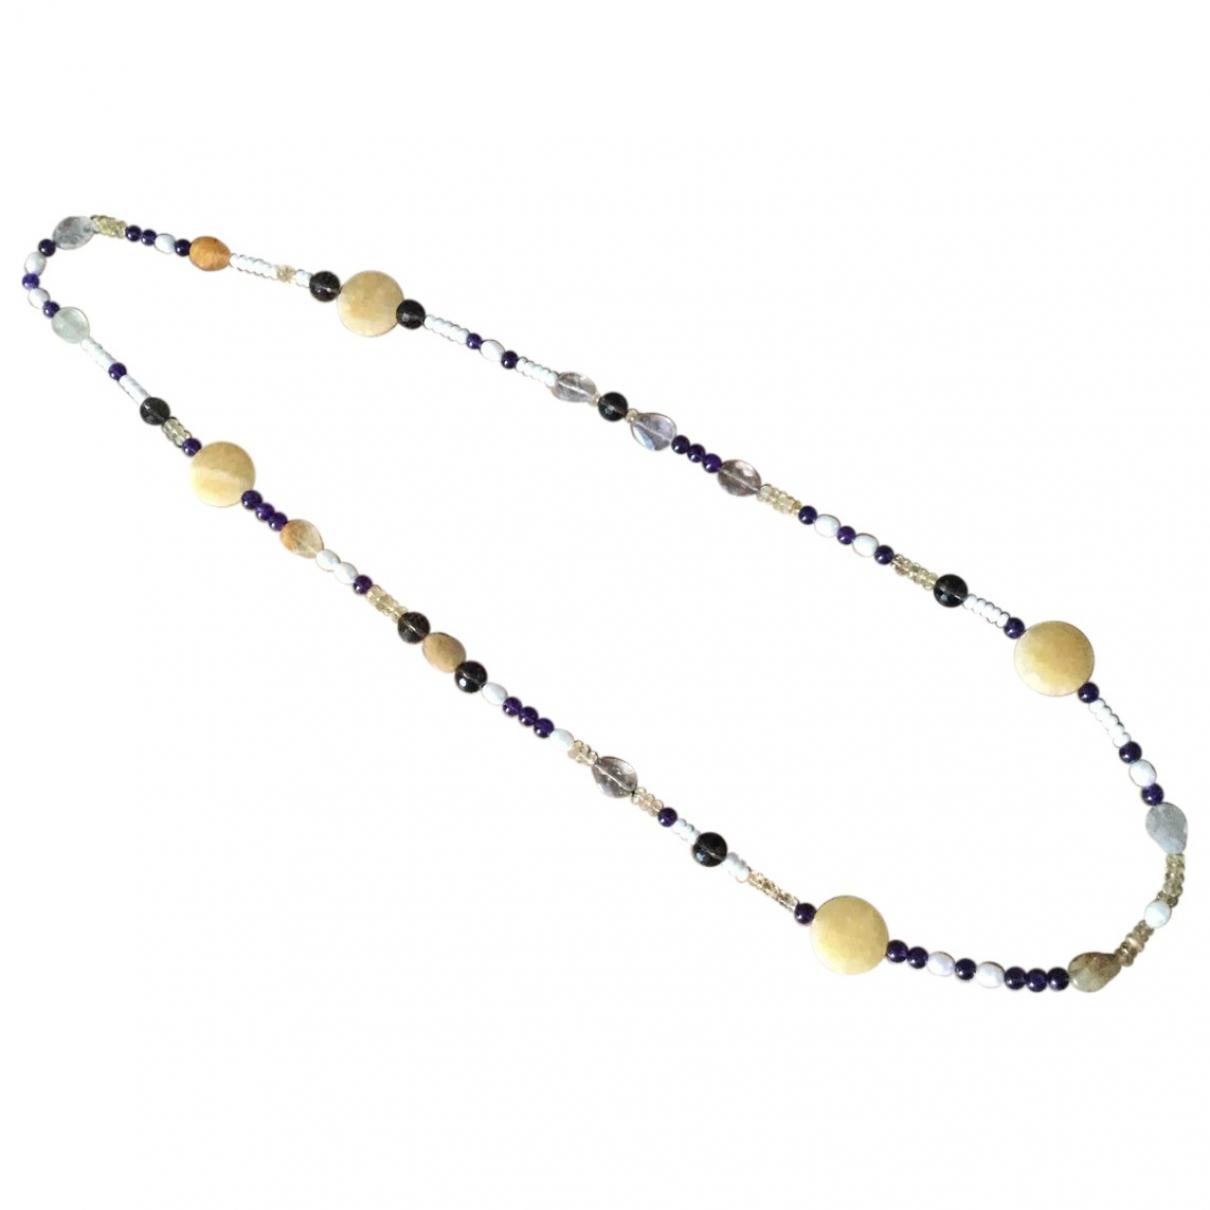 Non Signe / Unsigned Motifs Ethniques Halskette in  Bunt Perlen